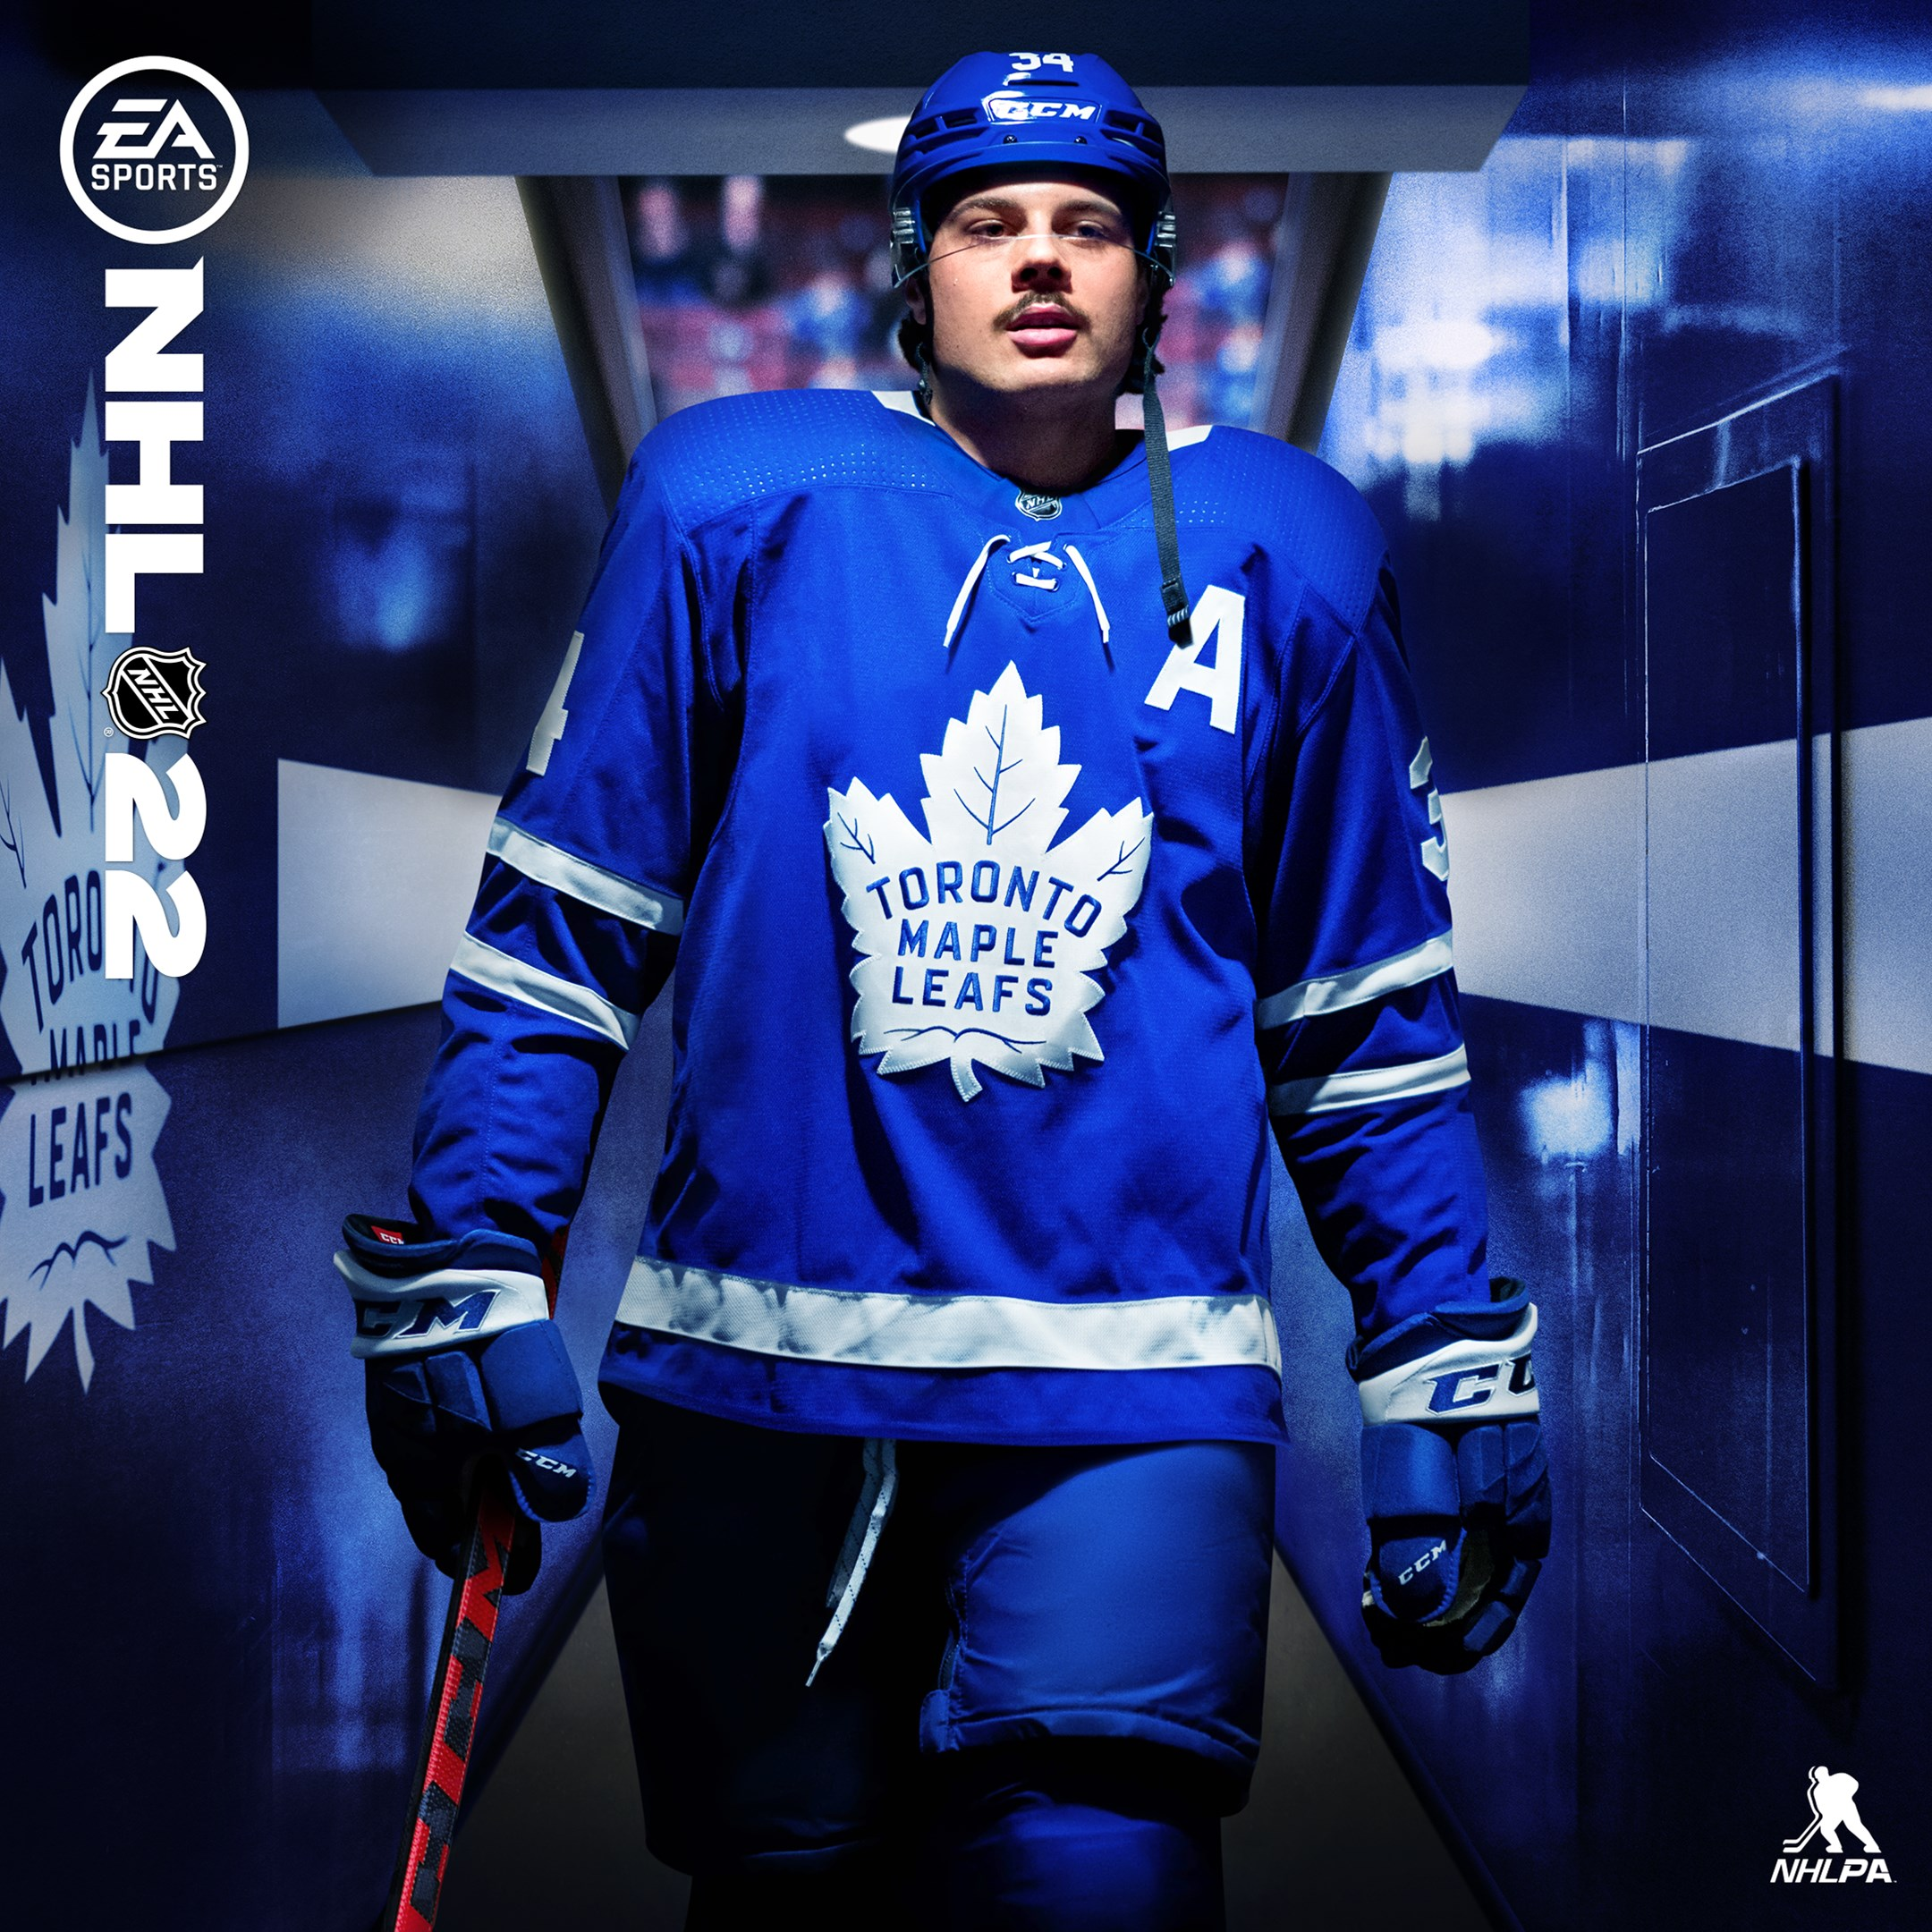 Image for NHL 22